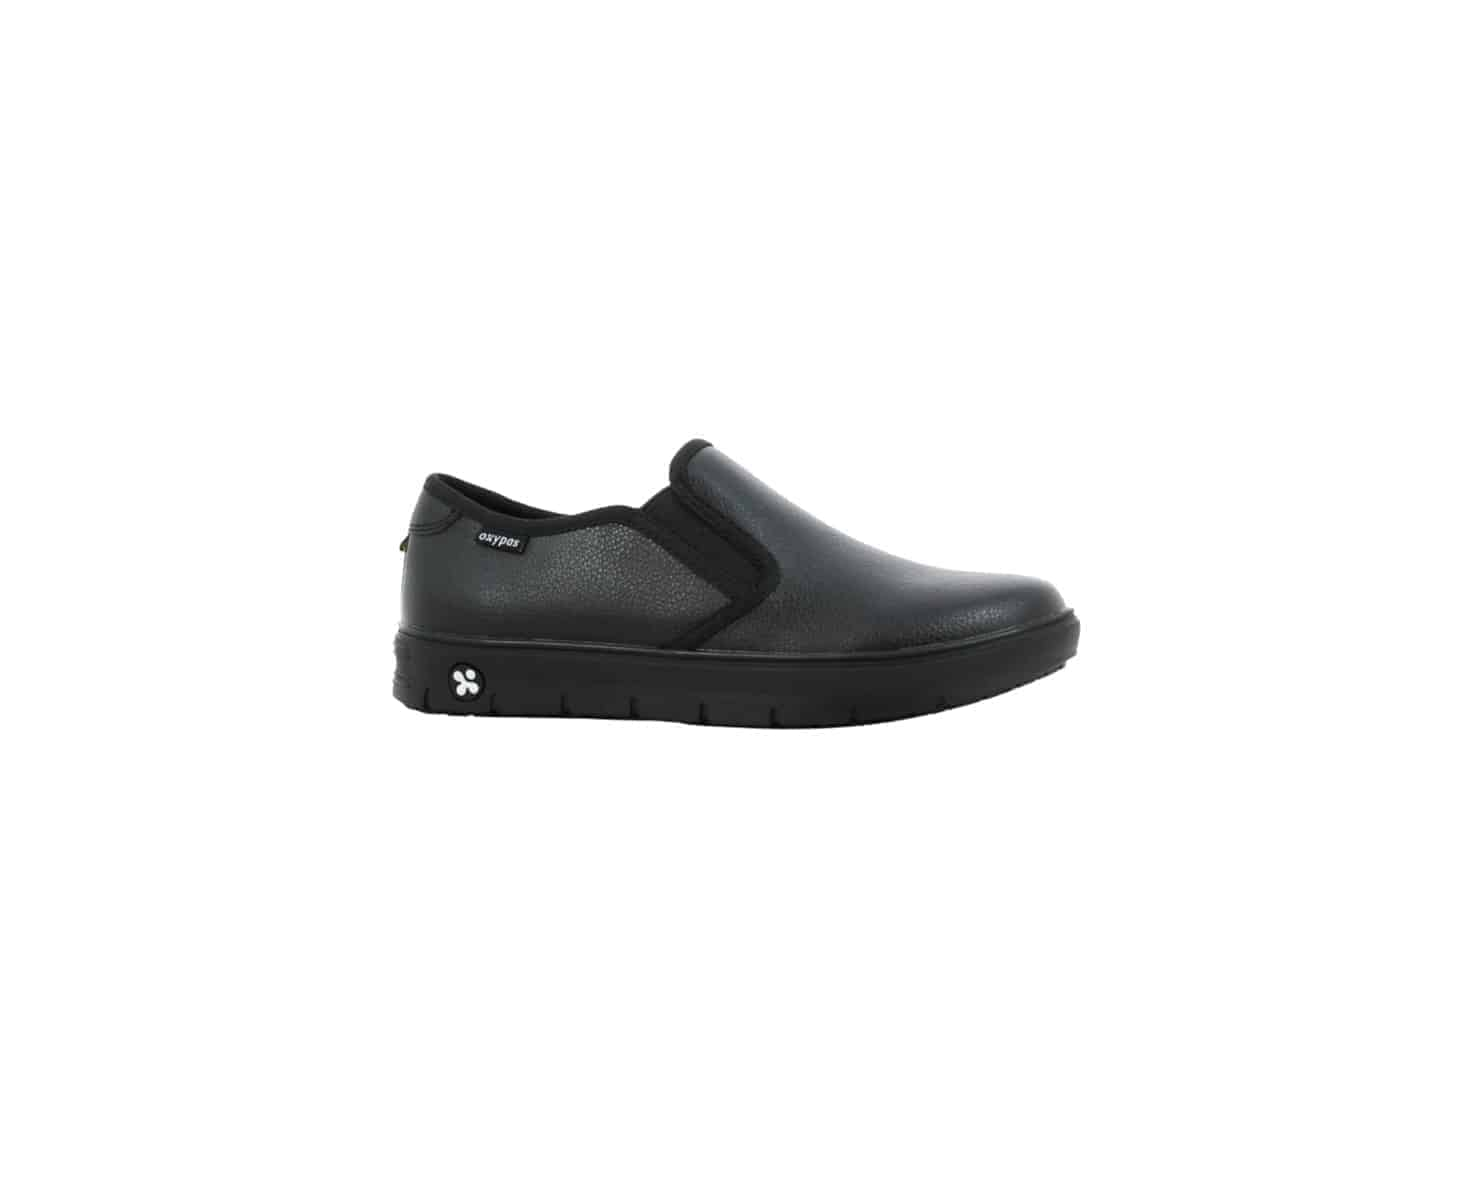 Oxypas 'Nadine', Slip-on Nursing Shoe